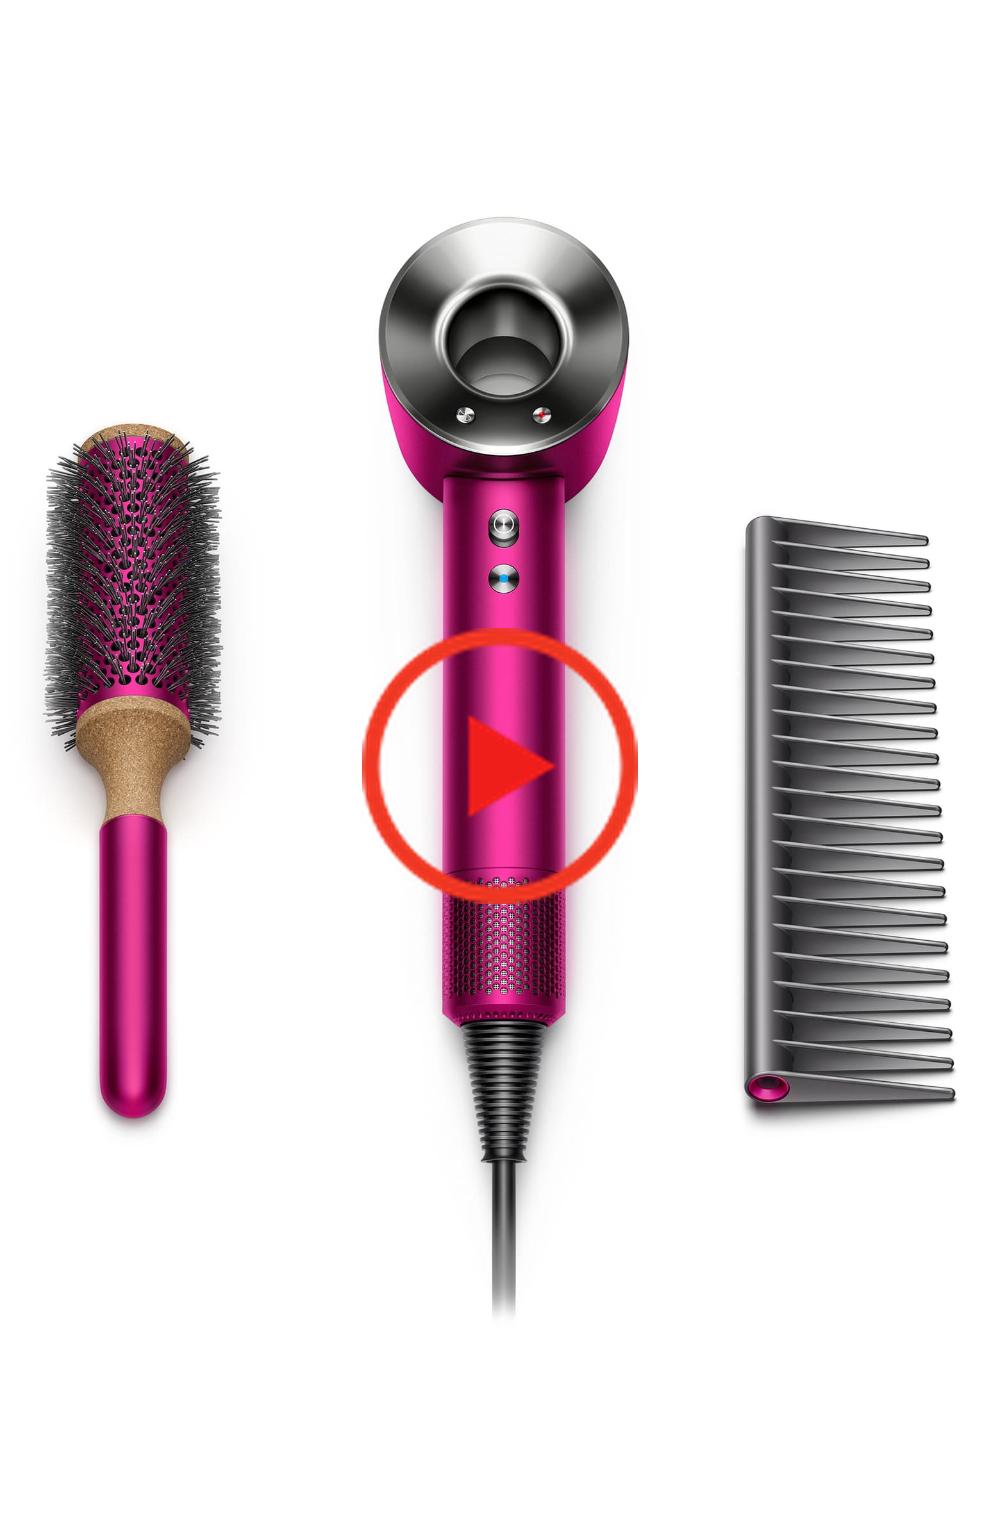 Dyson Supersonic Fuchsia Haartrockner Set Usd 465 Value Nordstrom Hair Dryer Set Hair Dryer Dyson